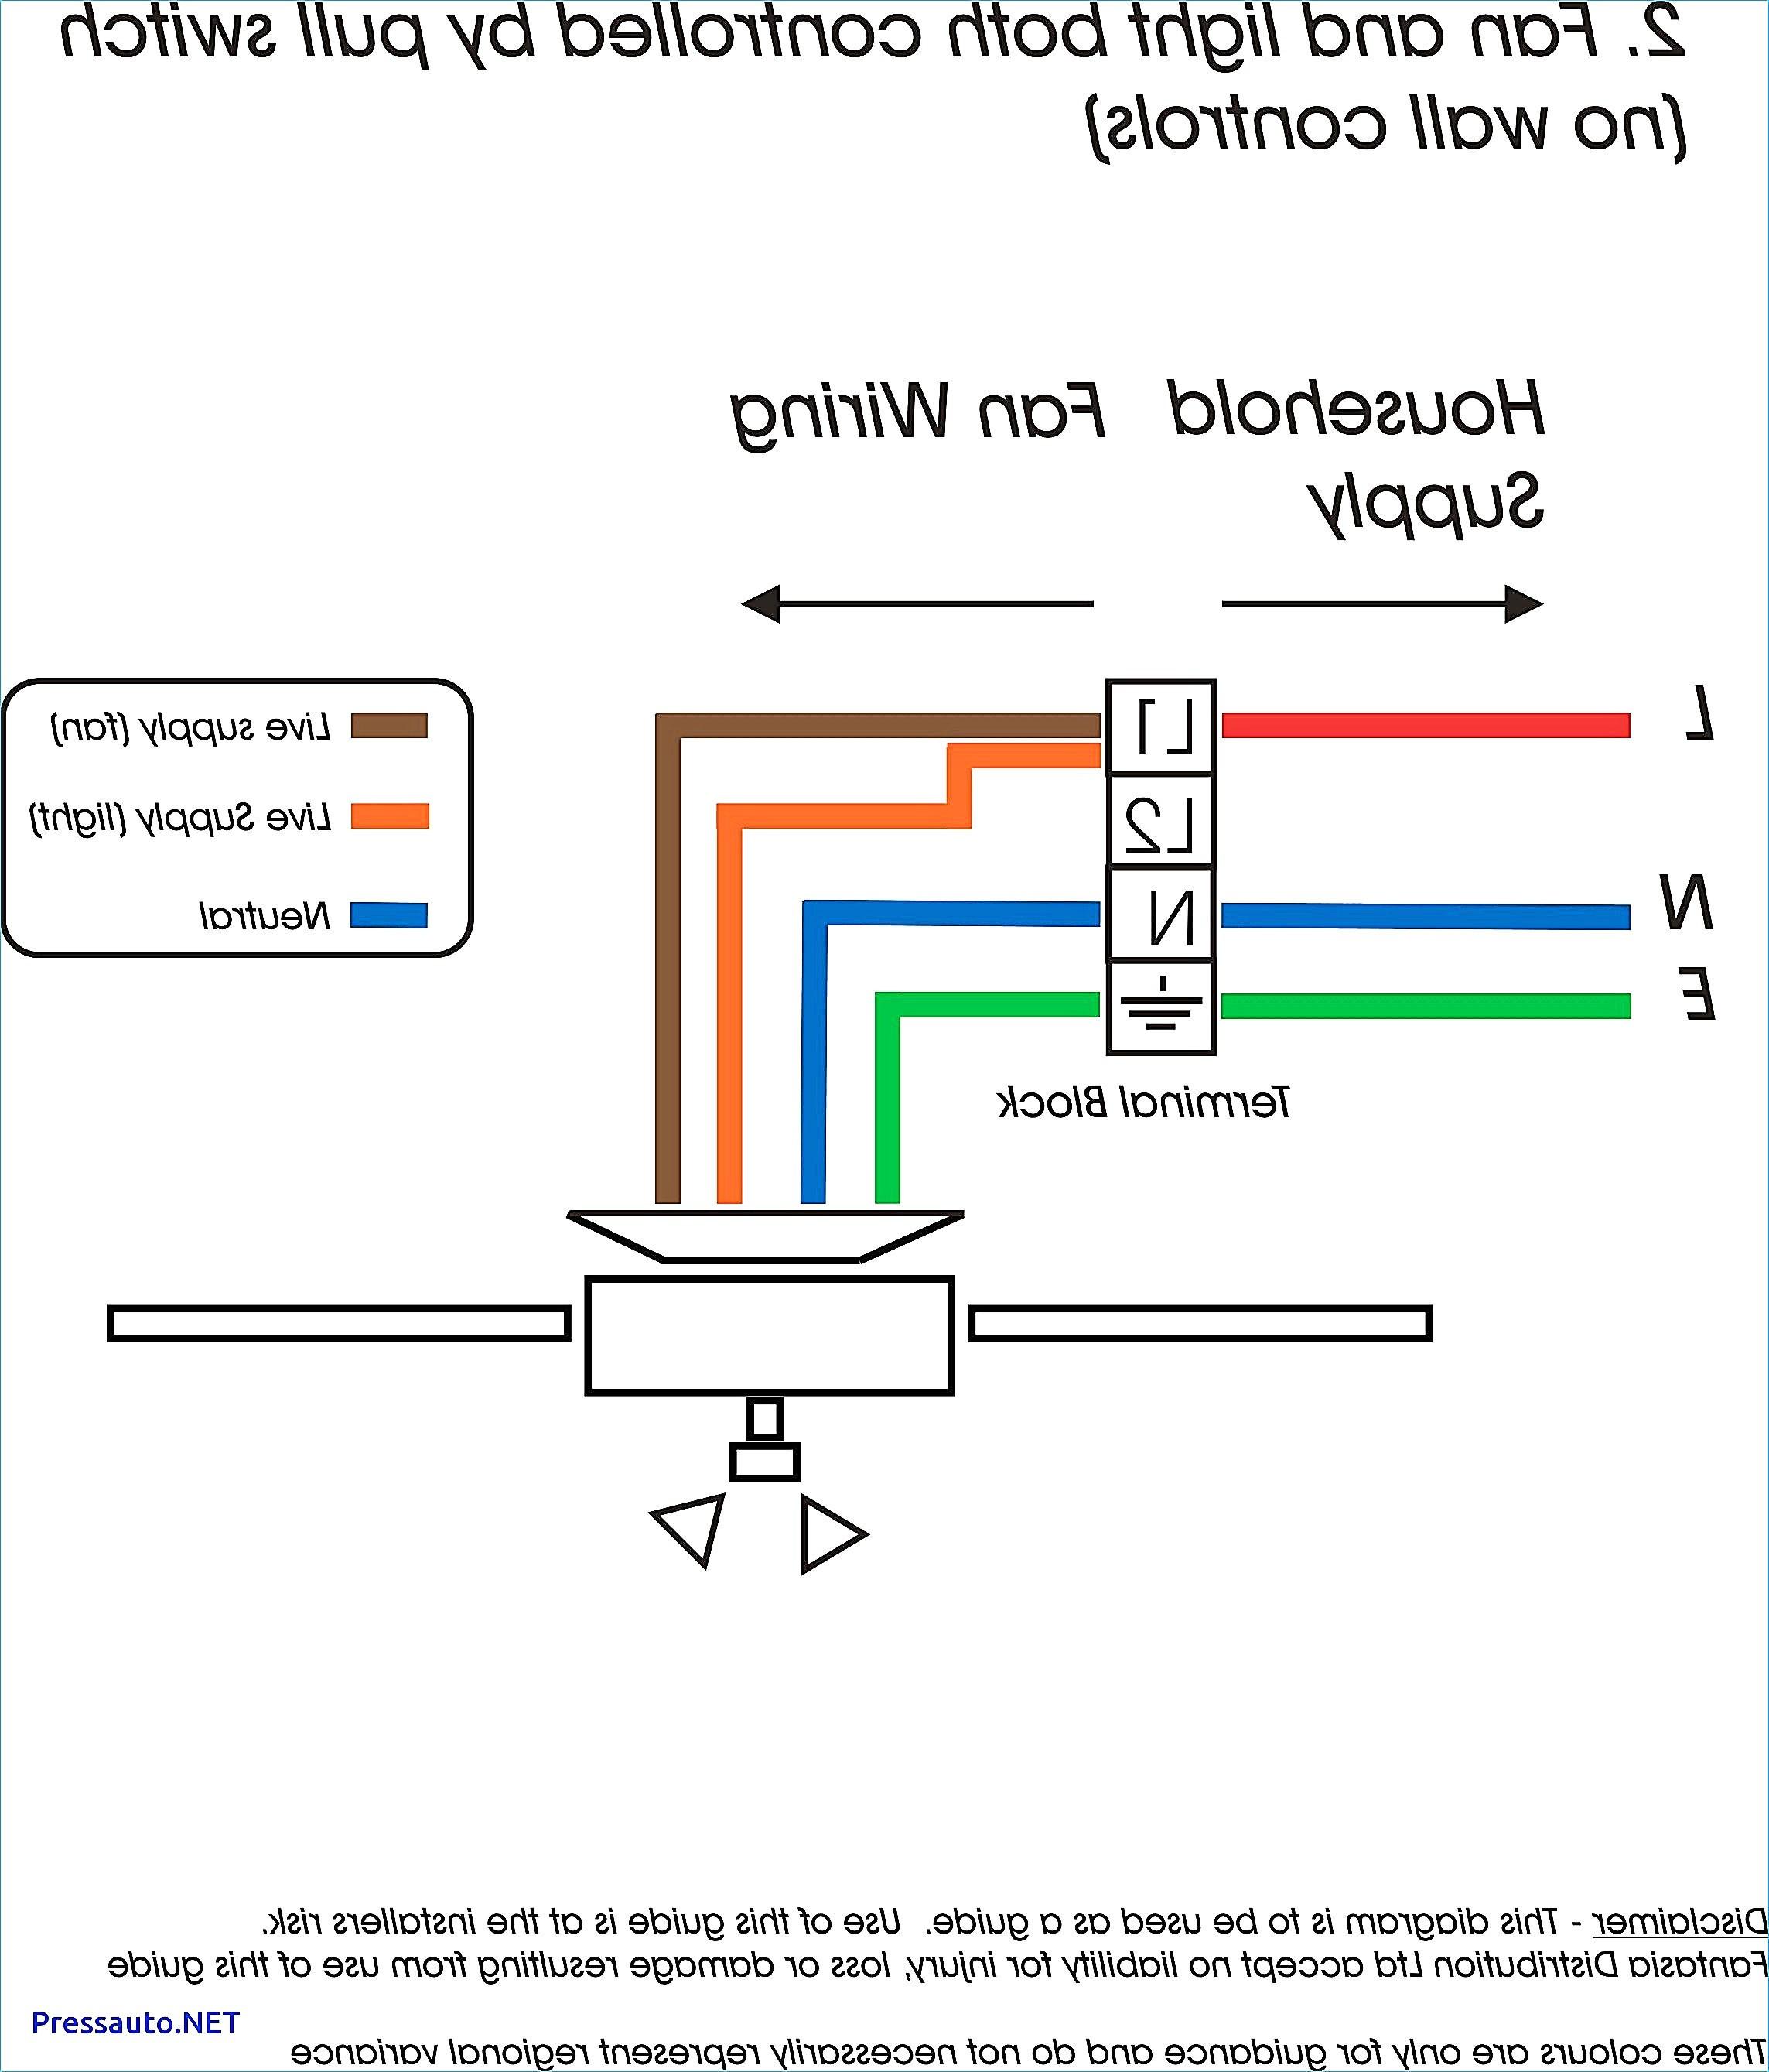 Embraco Compressor Wiring - Wiring Diagrams Schema